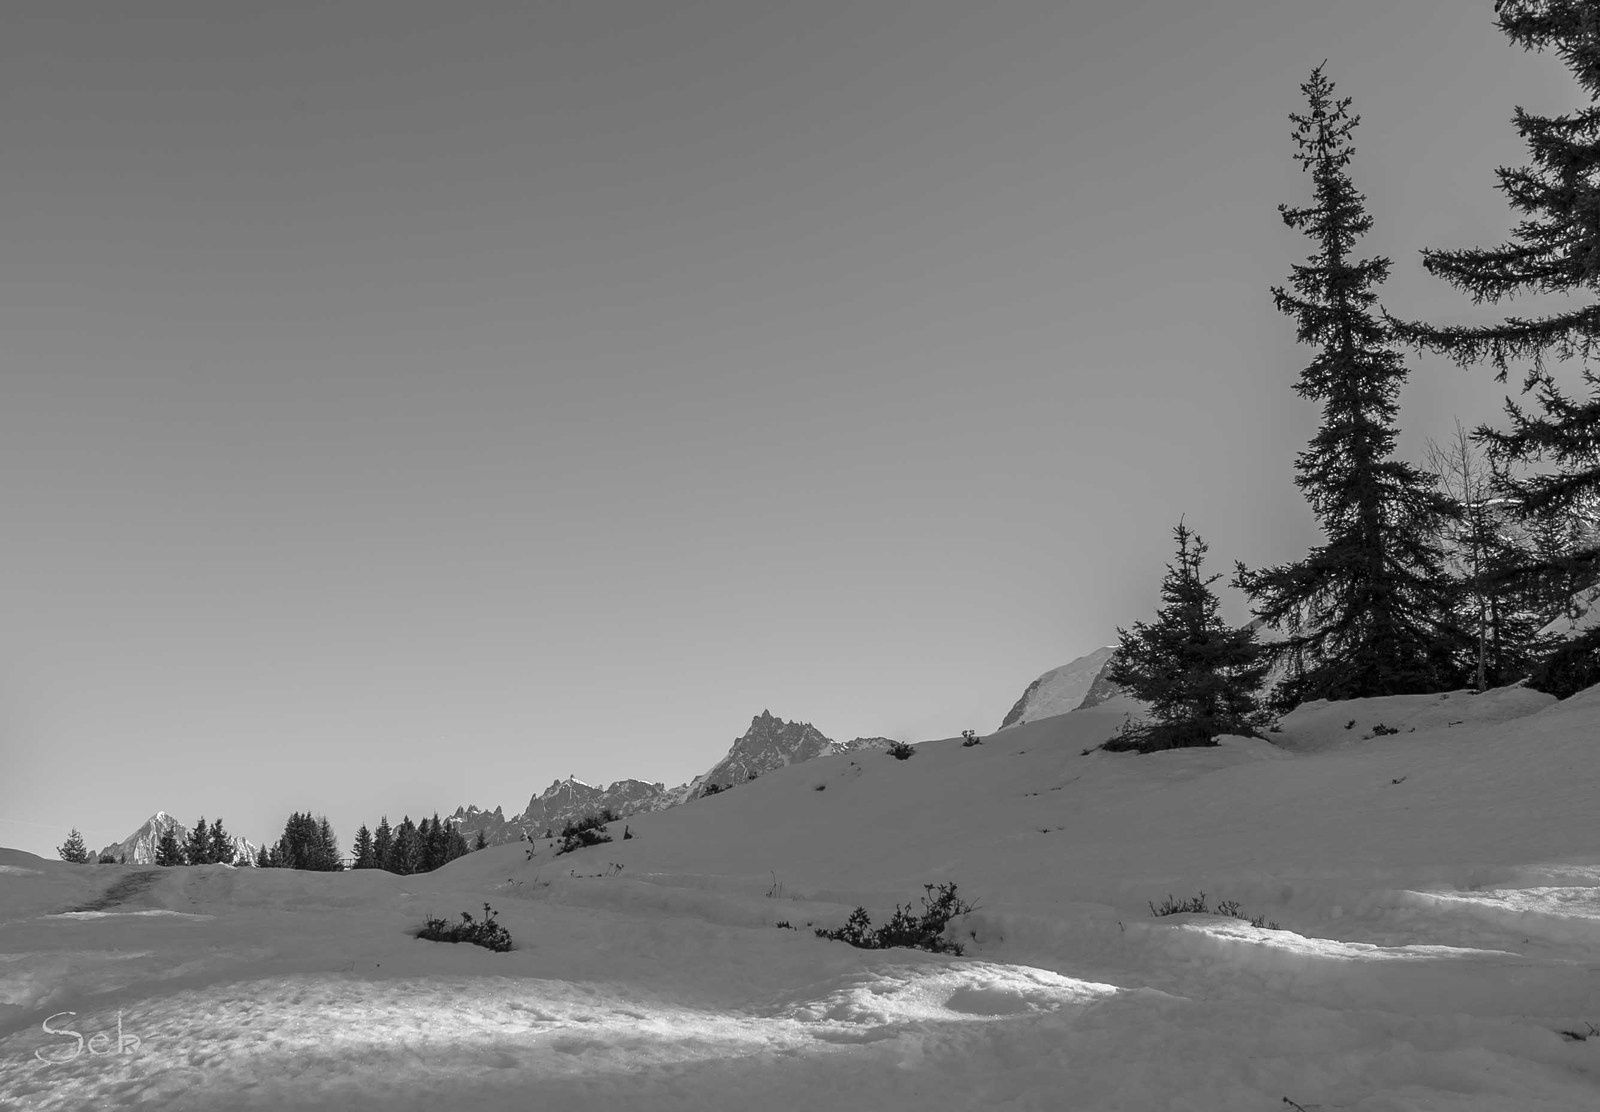 Les Houches, Prarion - Bellevue